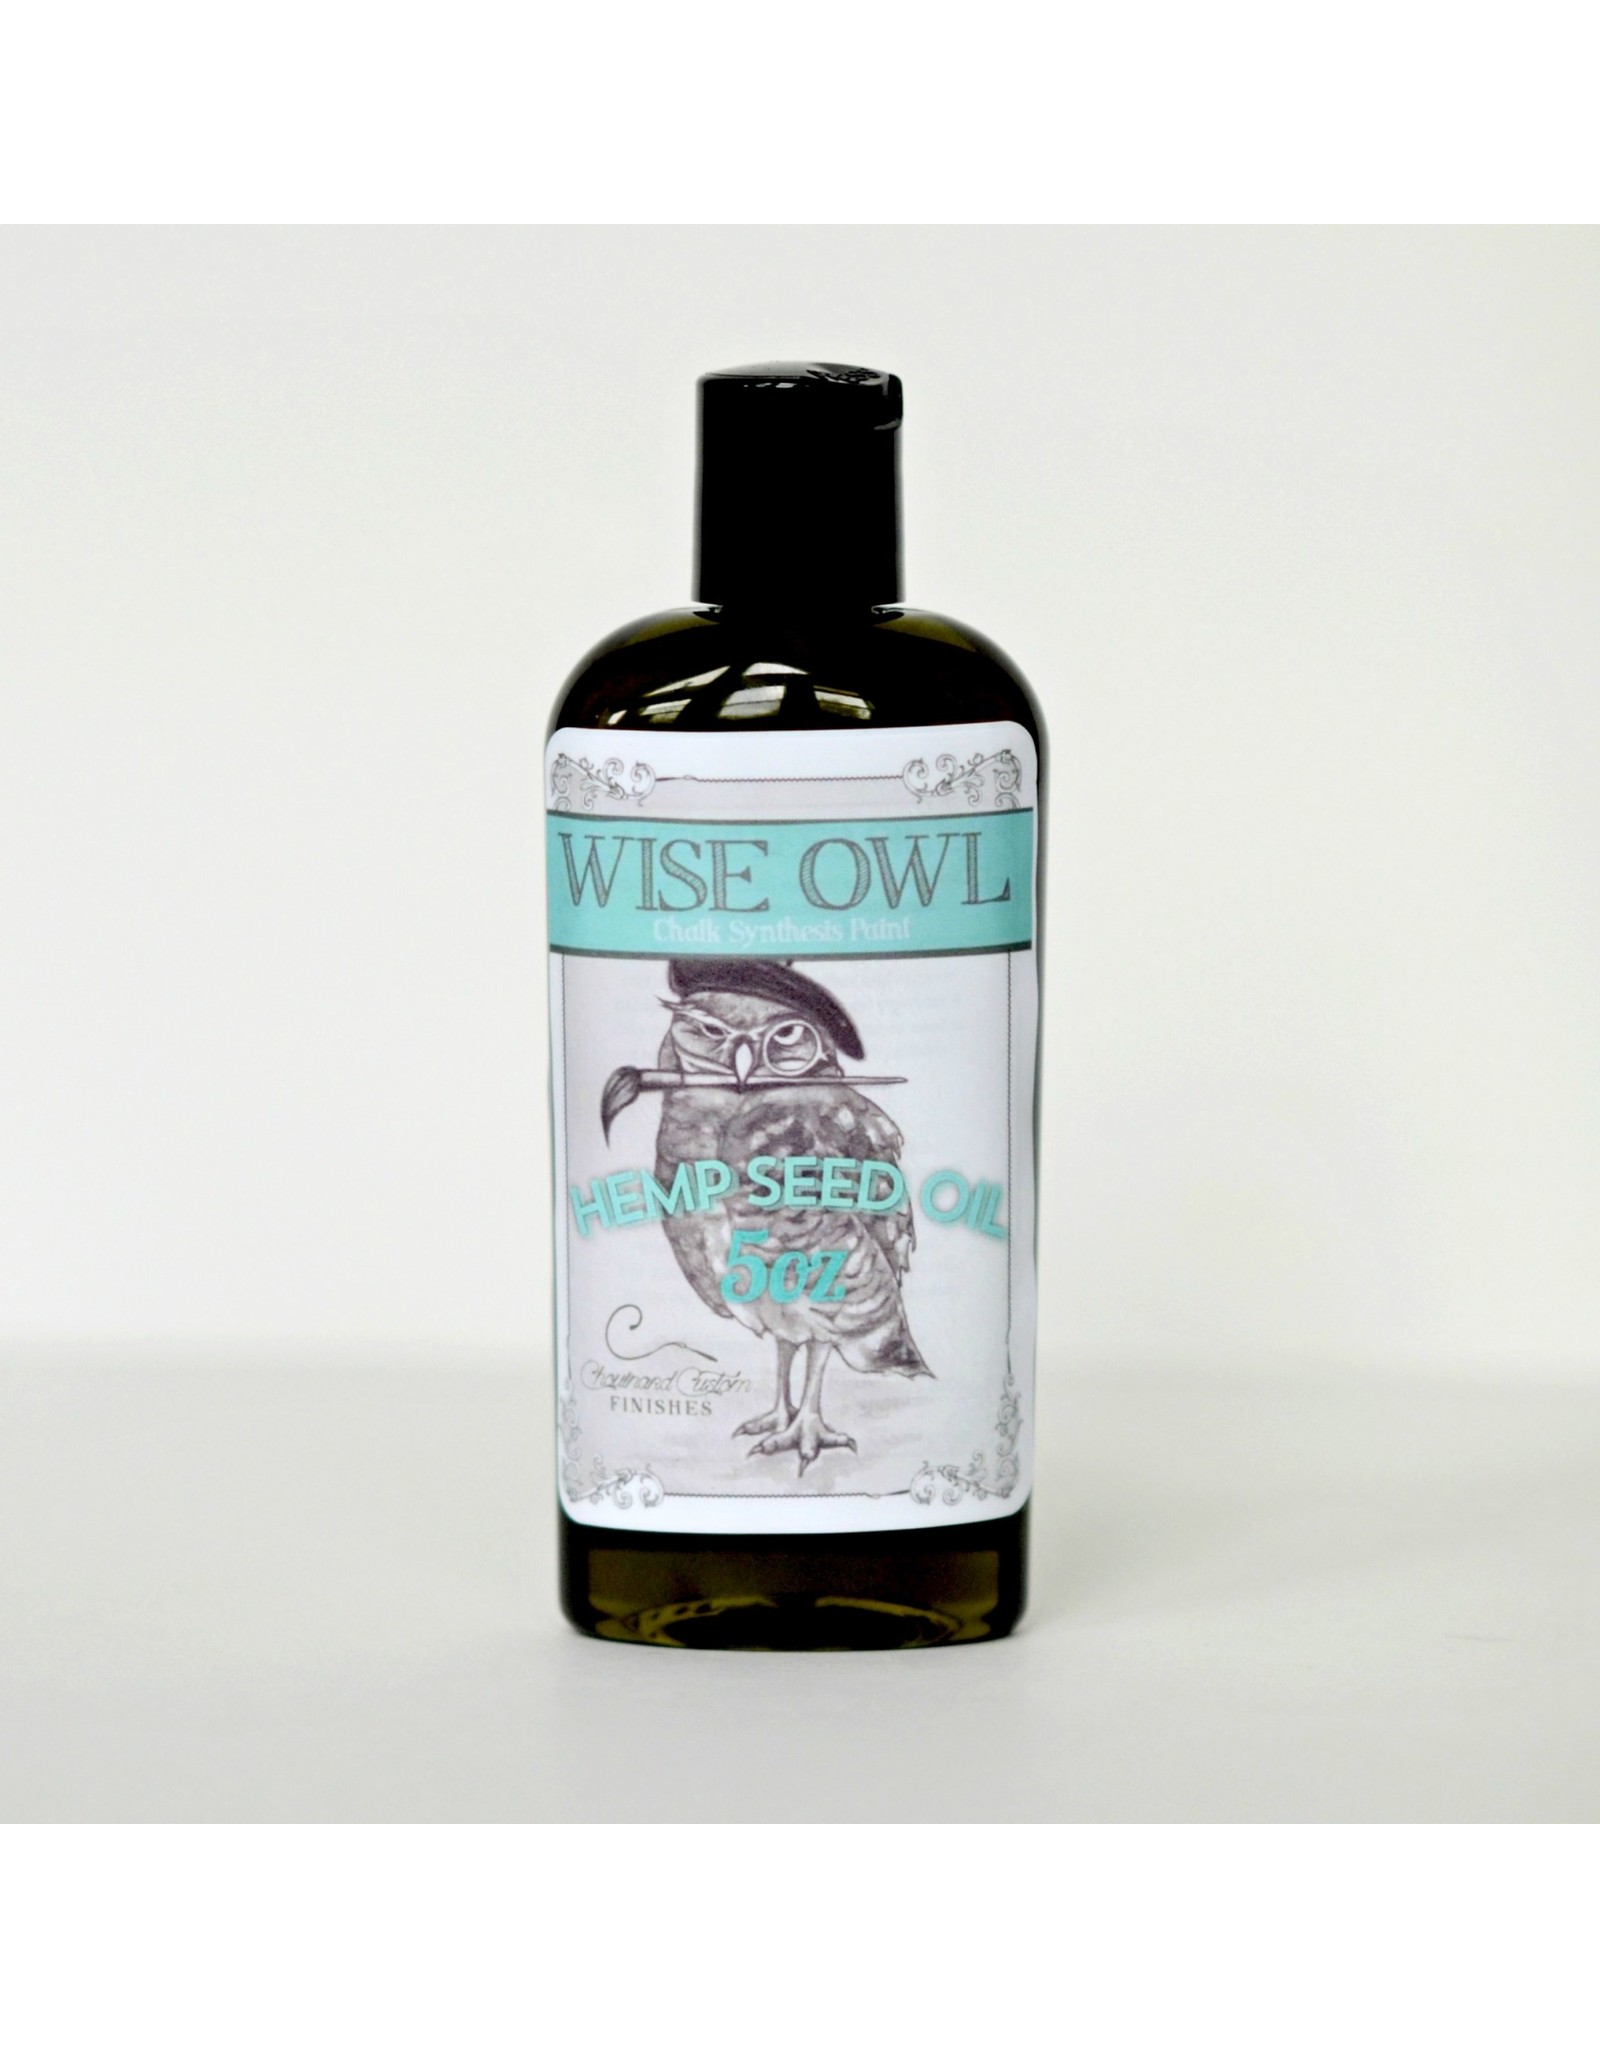 Wise Owl Paint Hemp Seed Oil - 16oz